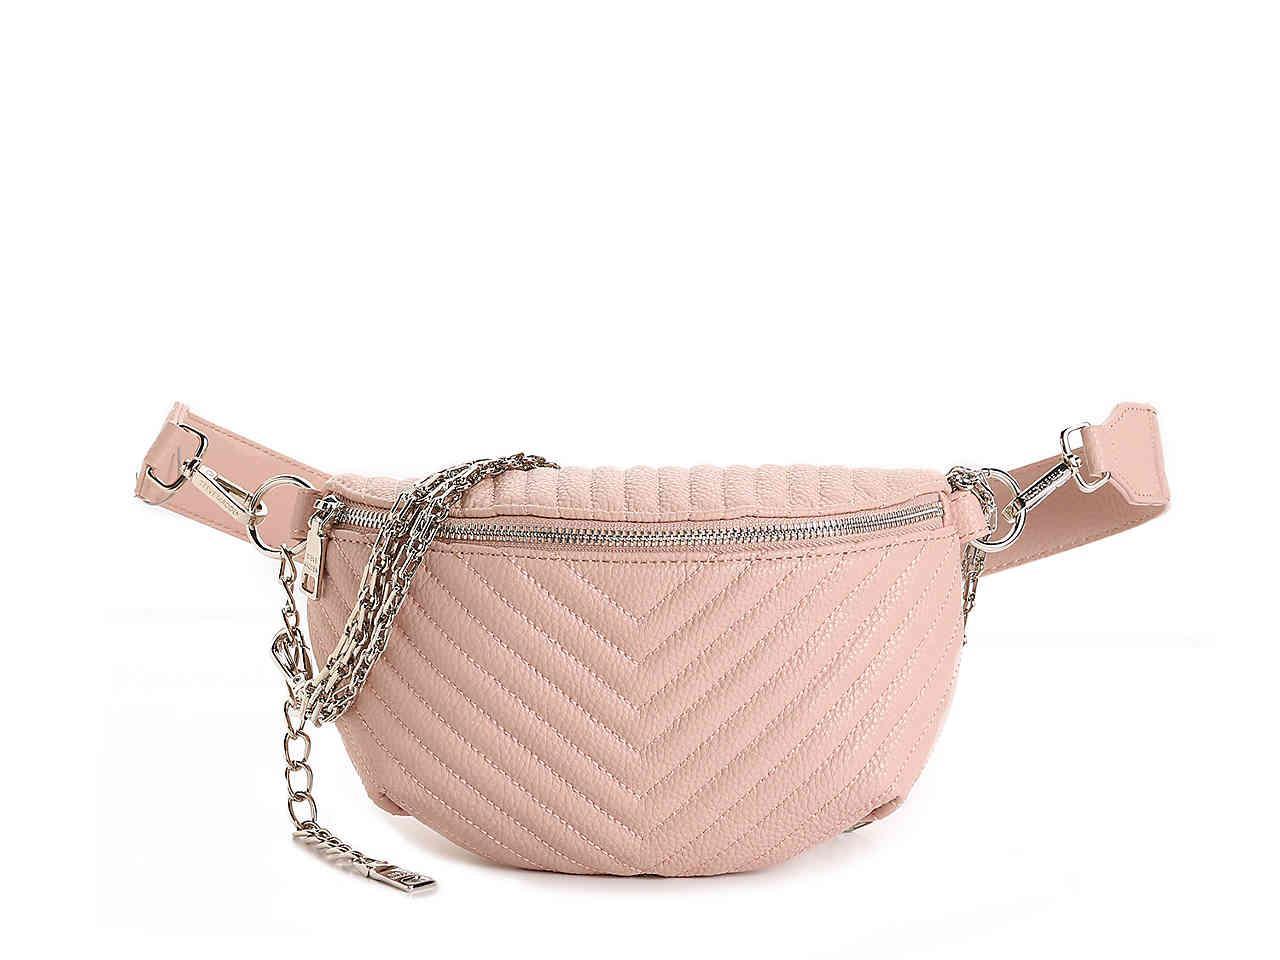 159208ae261 Lyst - Steve Madden Bfanny Belt Bag in Pink